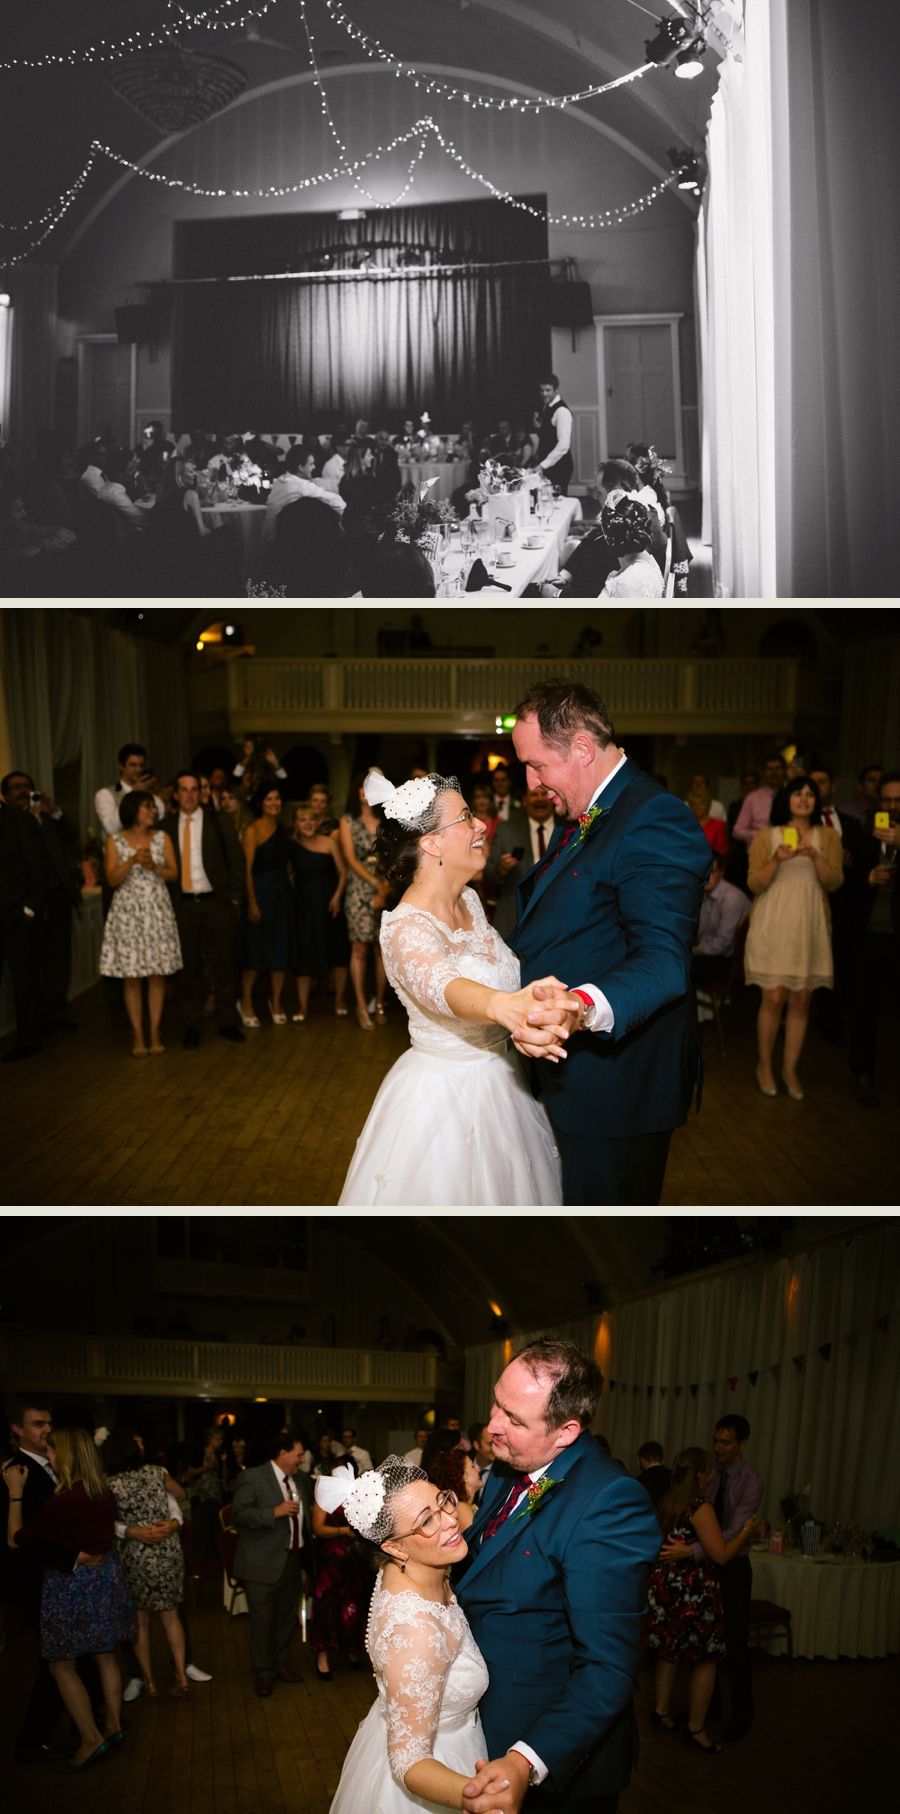 Somerset Wedding Photographer Bowdon Rooms Wedding Emma and Chris_0035.jpg